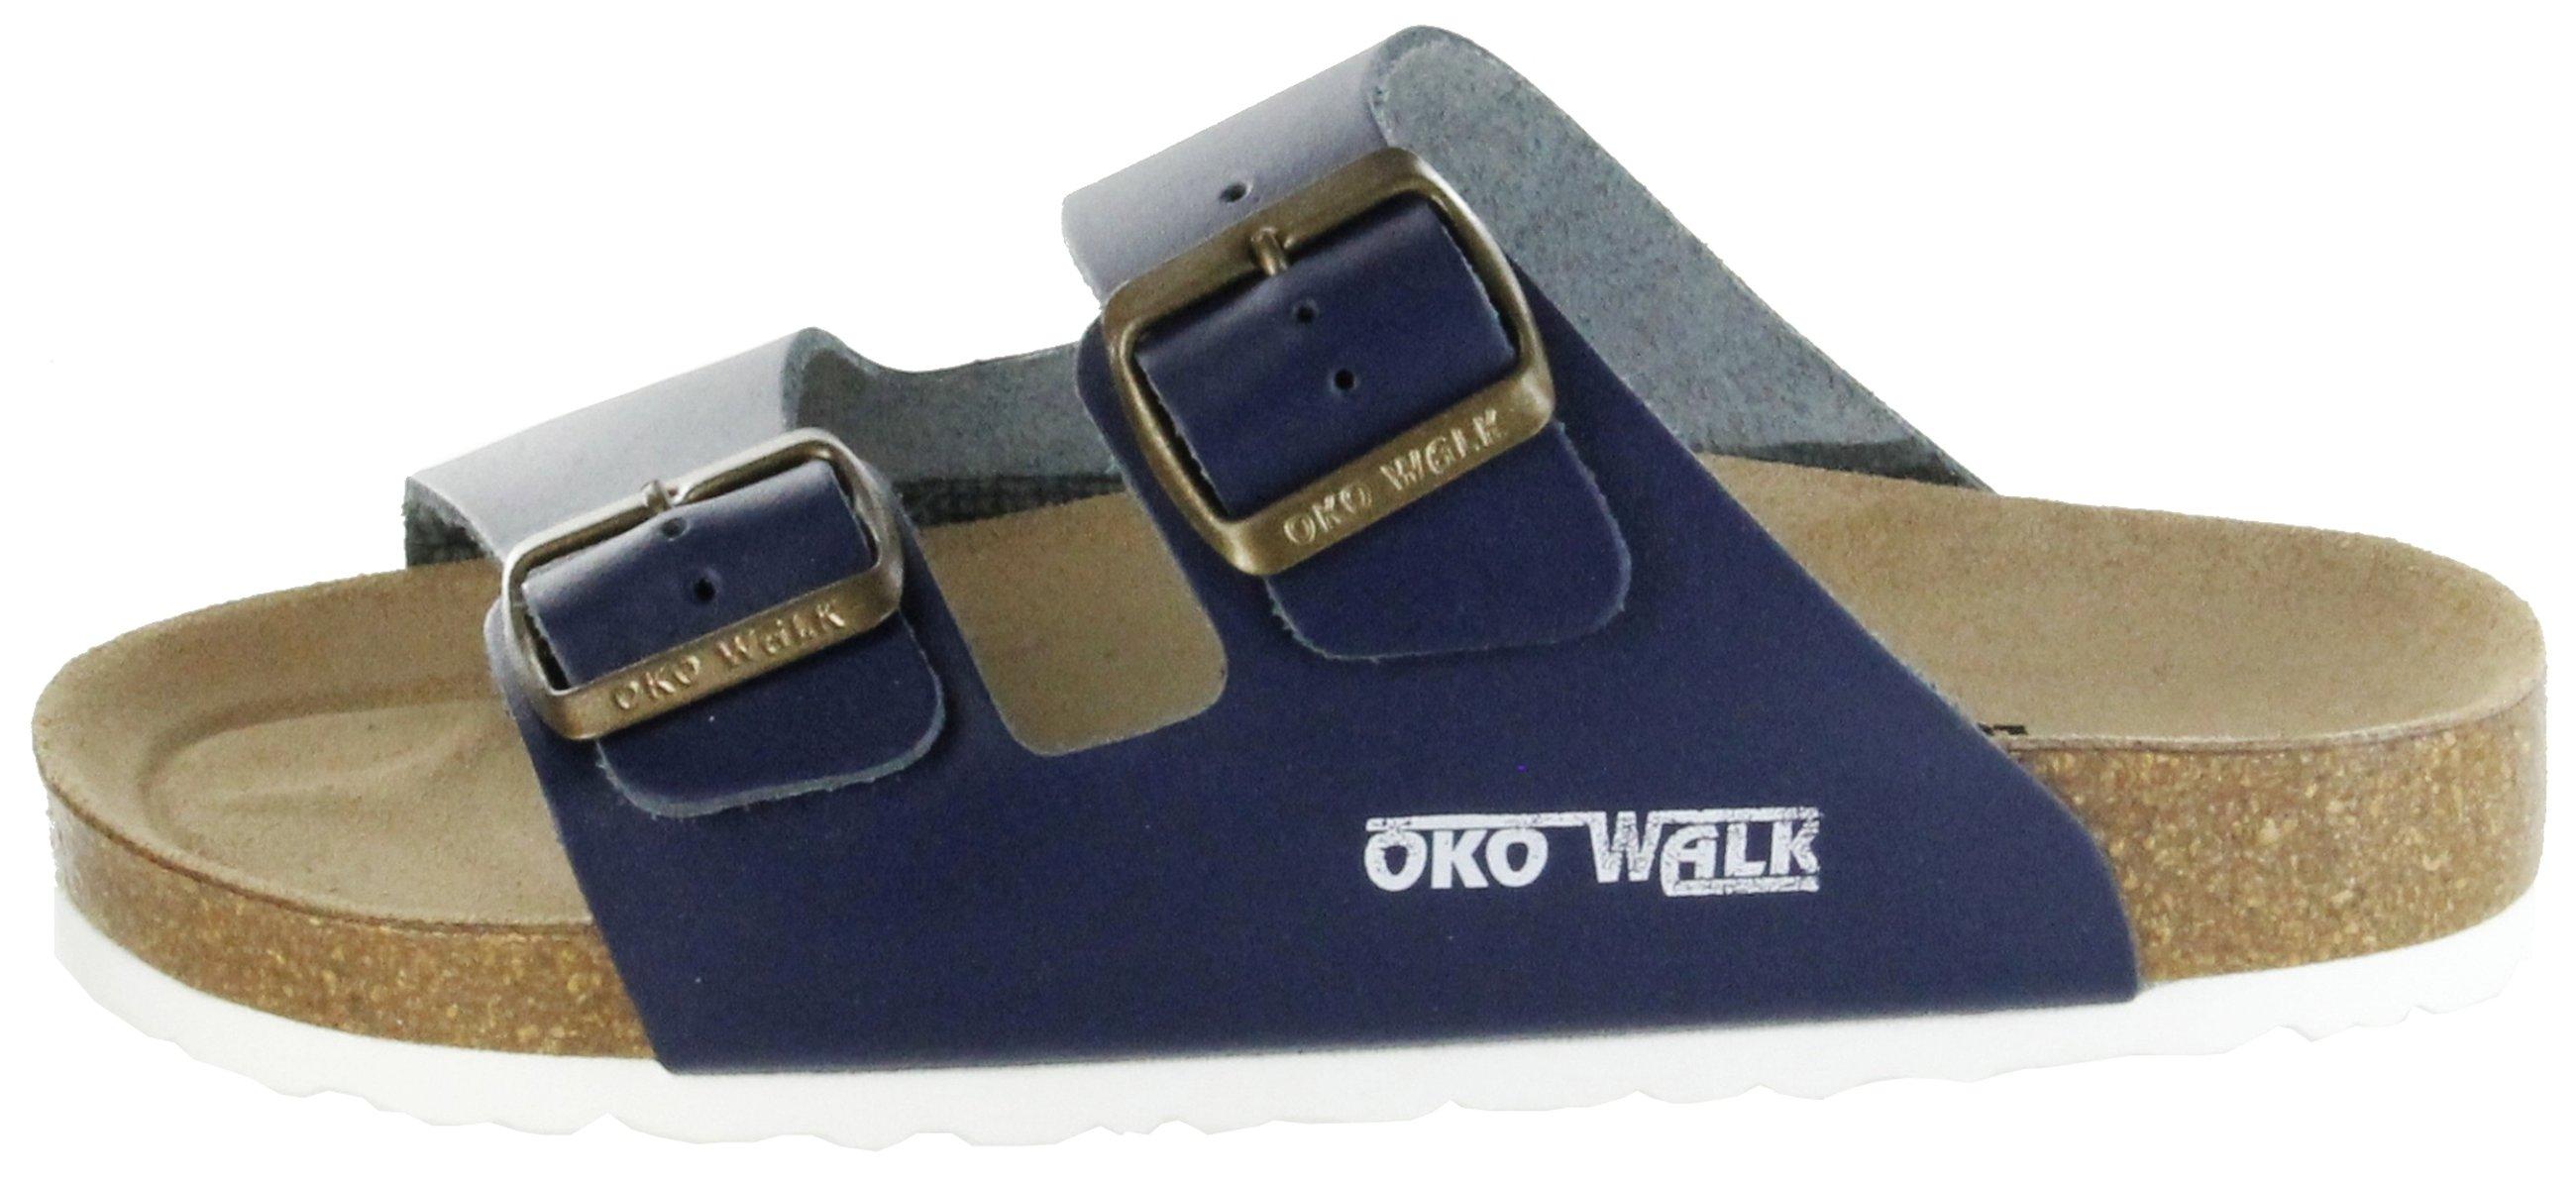 check out 10870 ba872 ÖkoWalk Bios Sandalen Hausschuhe Lederdeck blau leicht non-marking Sohle  Herren Schuhe Theo